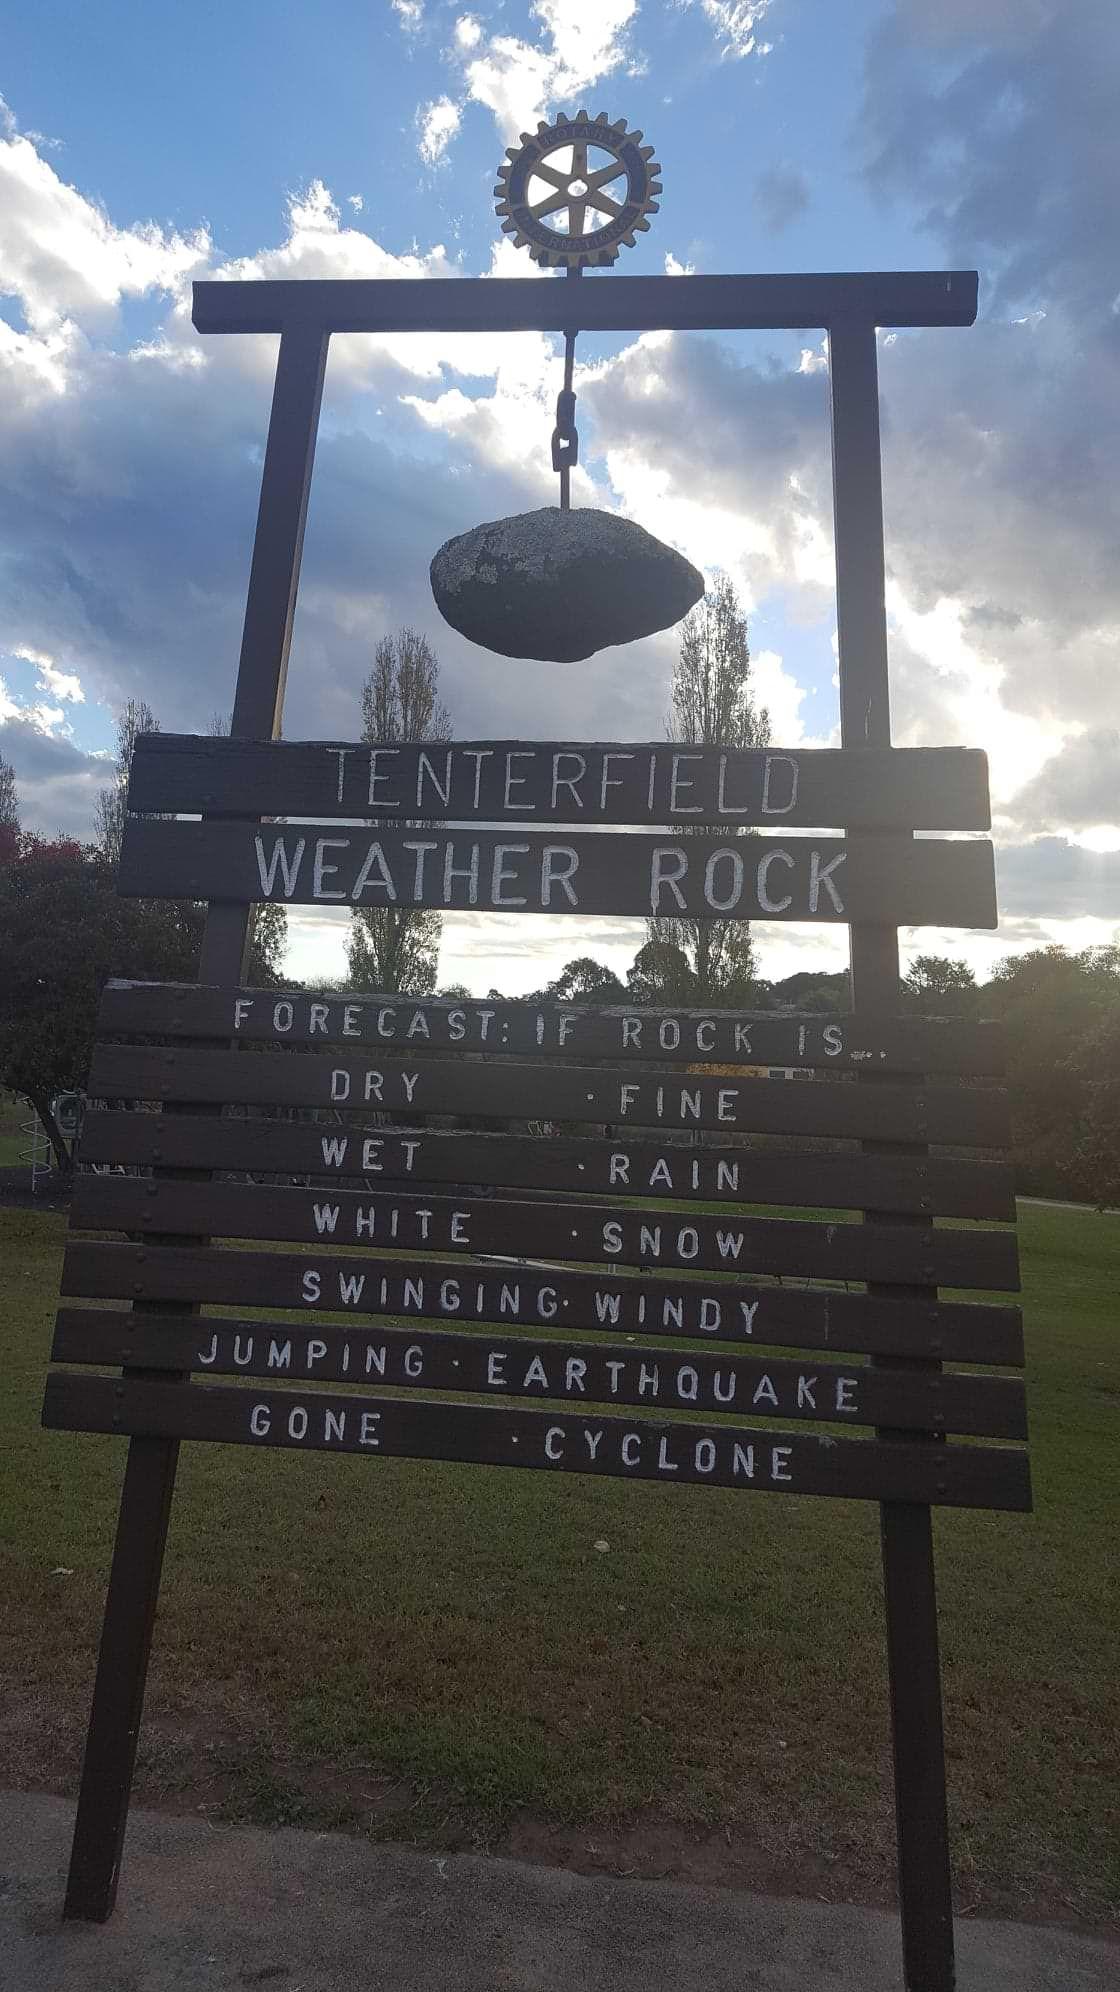 This Weather Rock in Regional NSW,Australia.